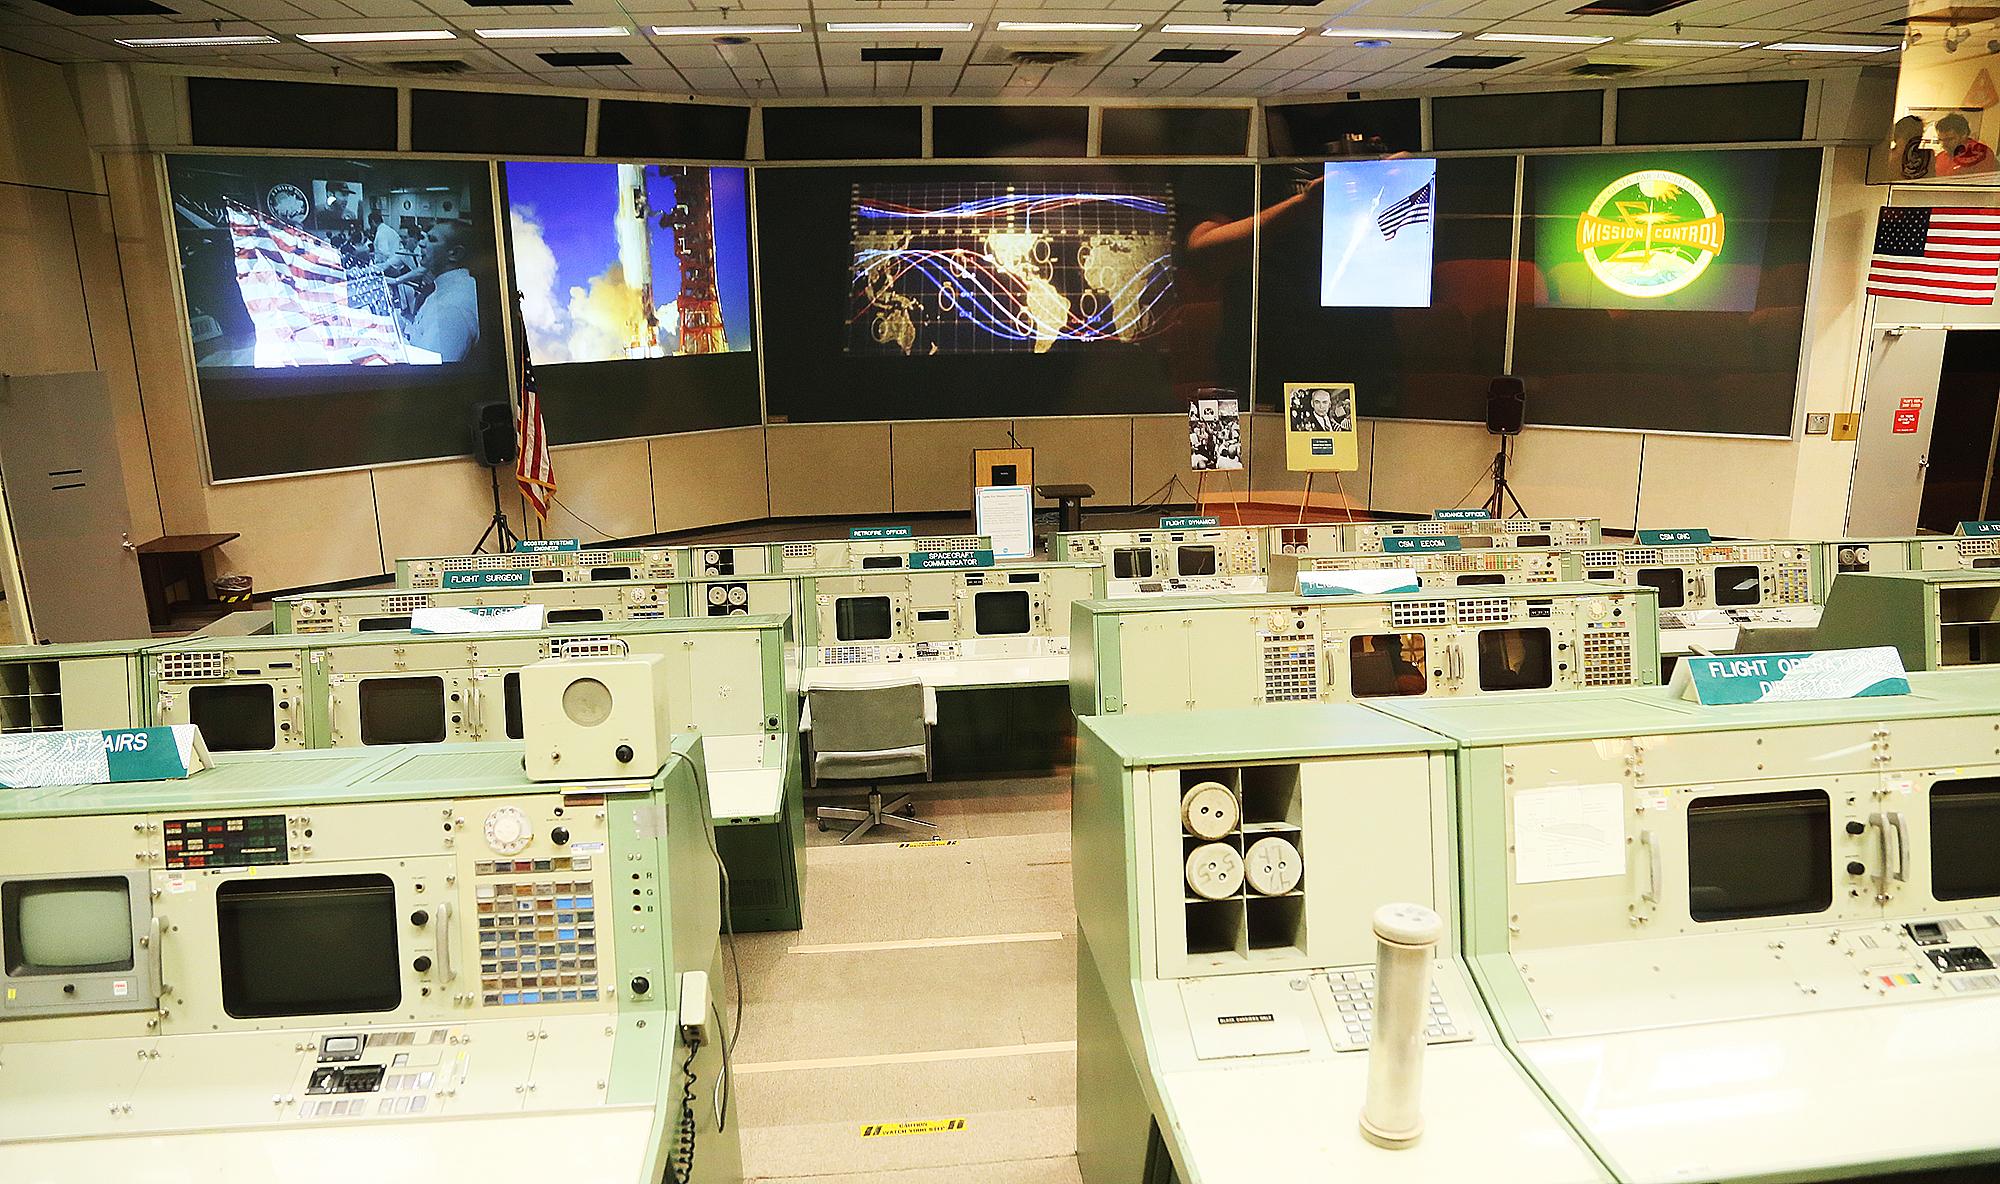 spacecenter-big2.jpg